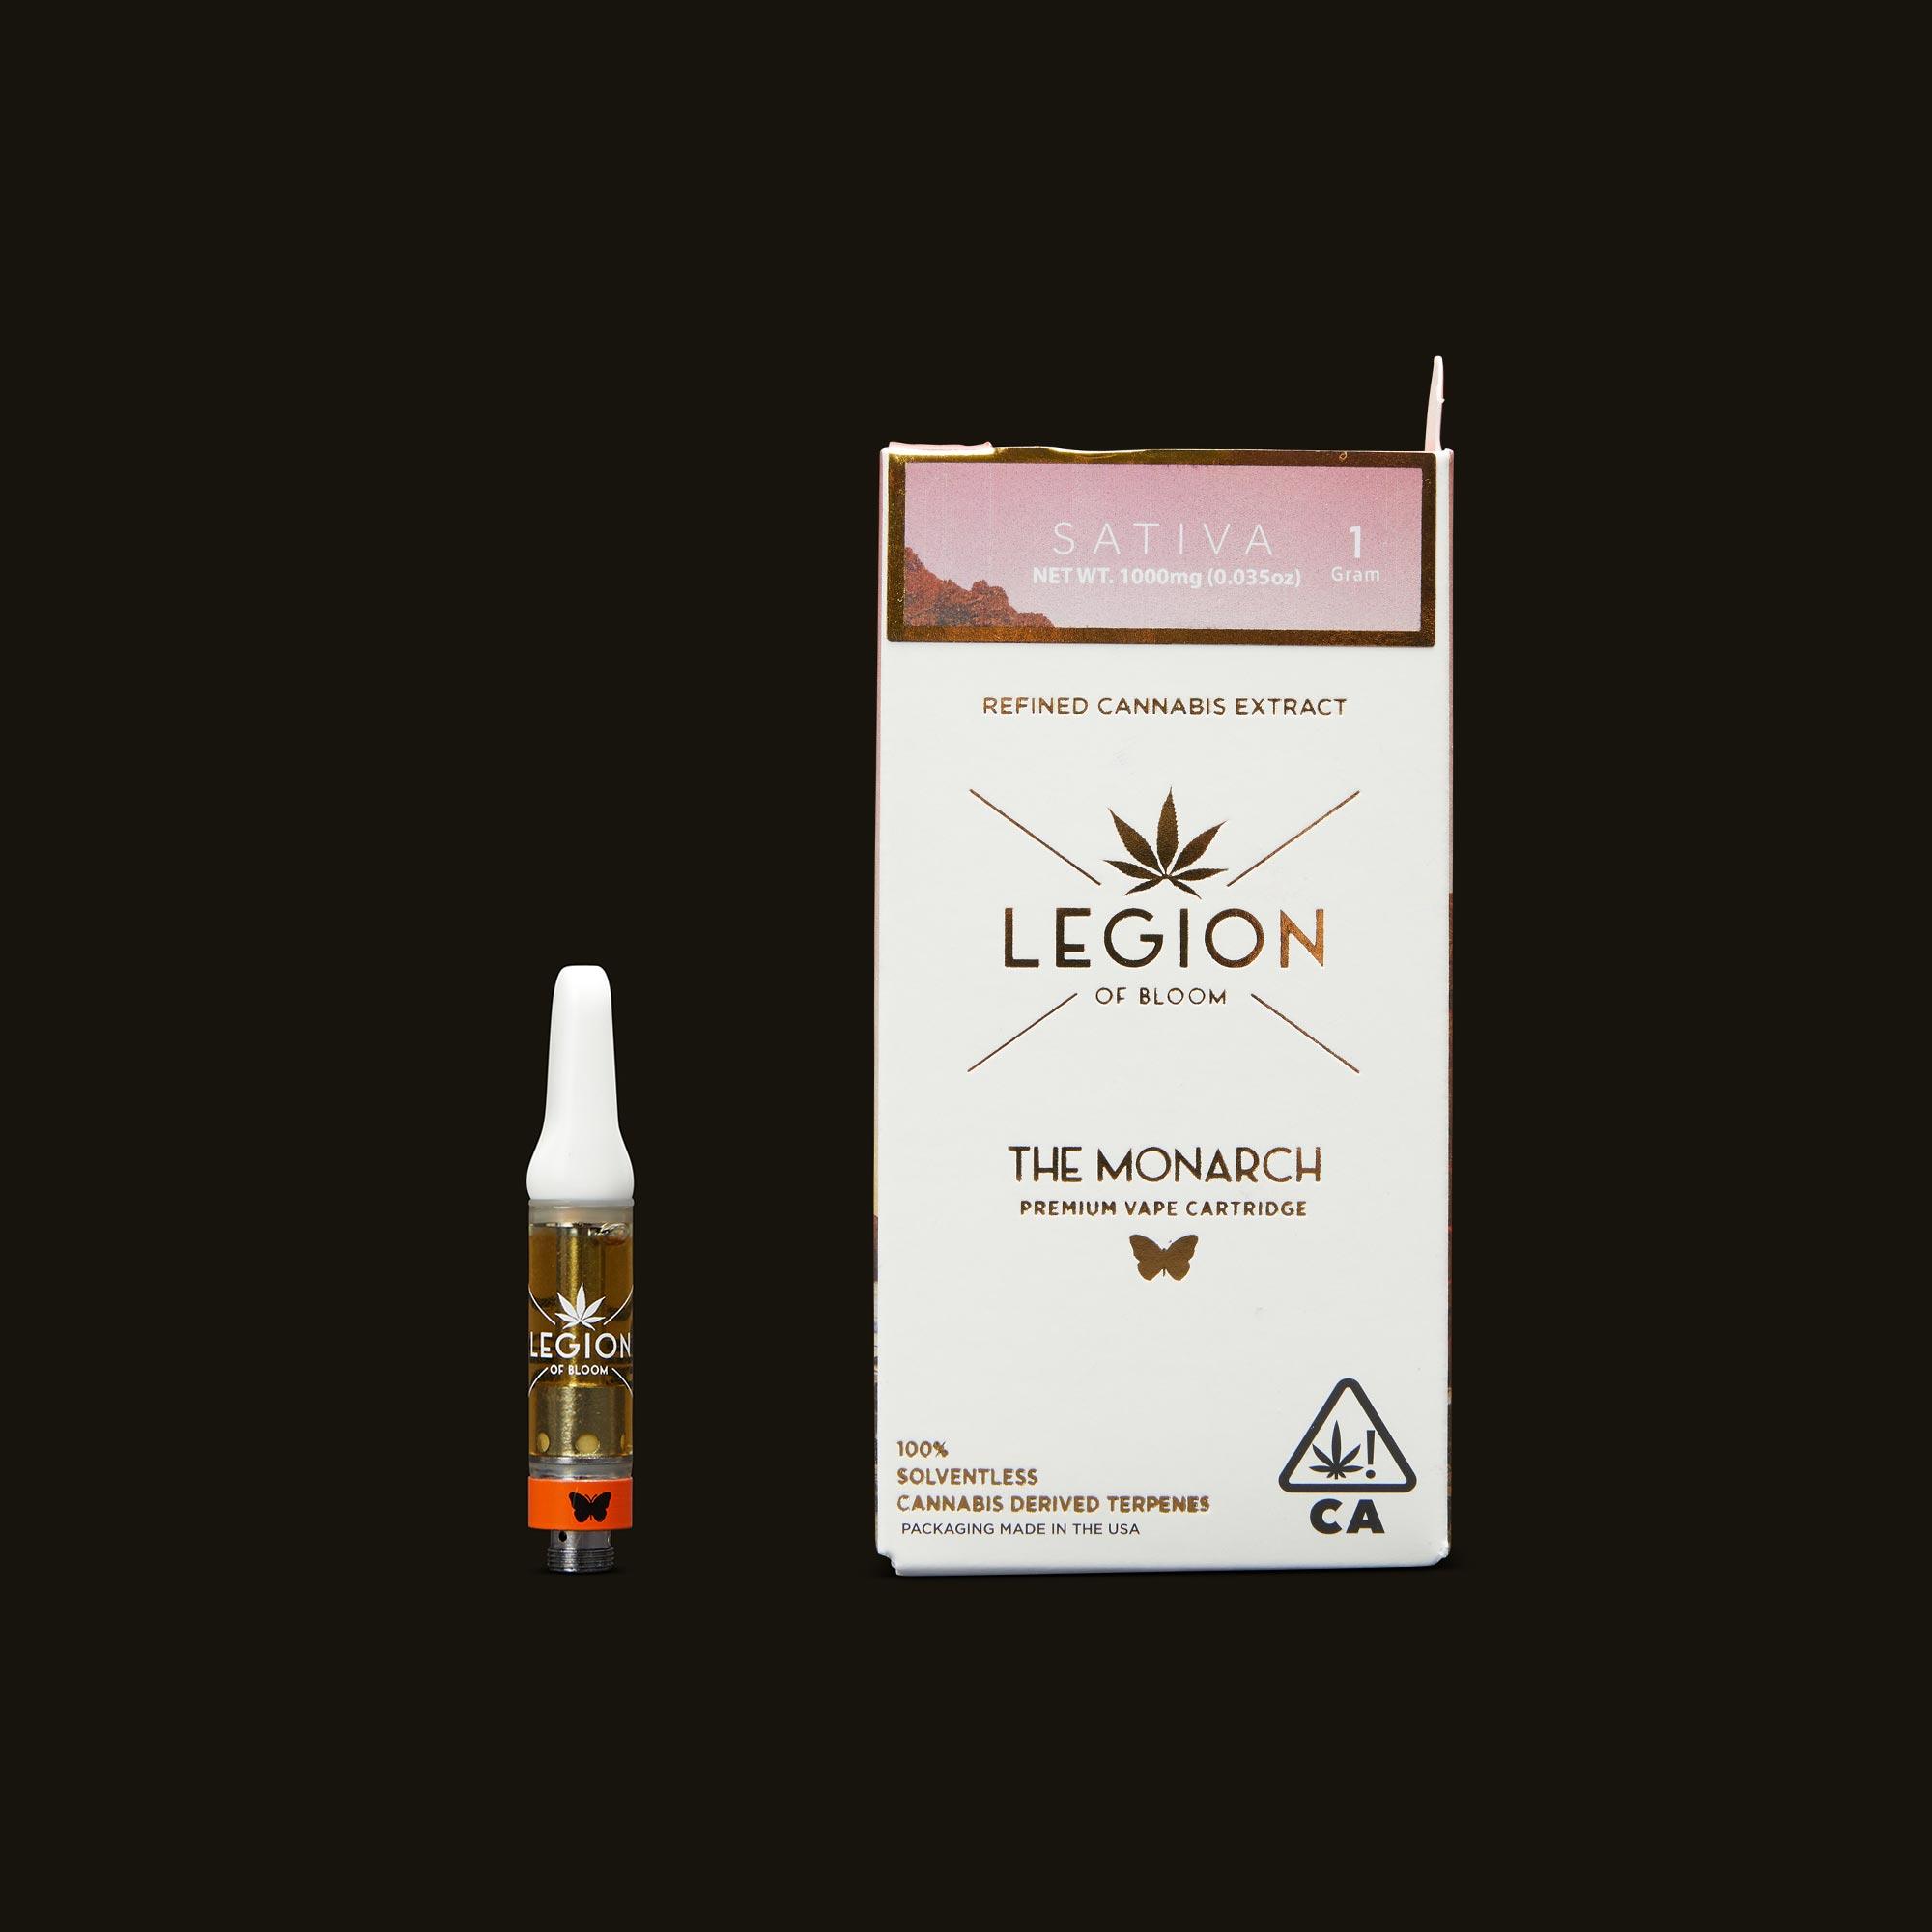 Legion of Bloom Chernobyl Monarch 1g